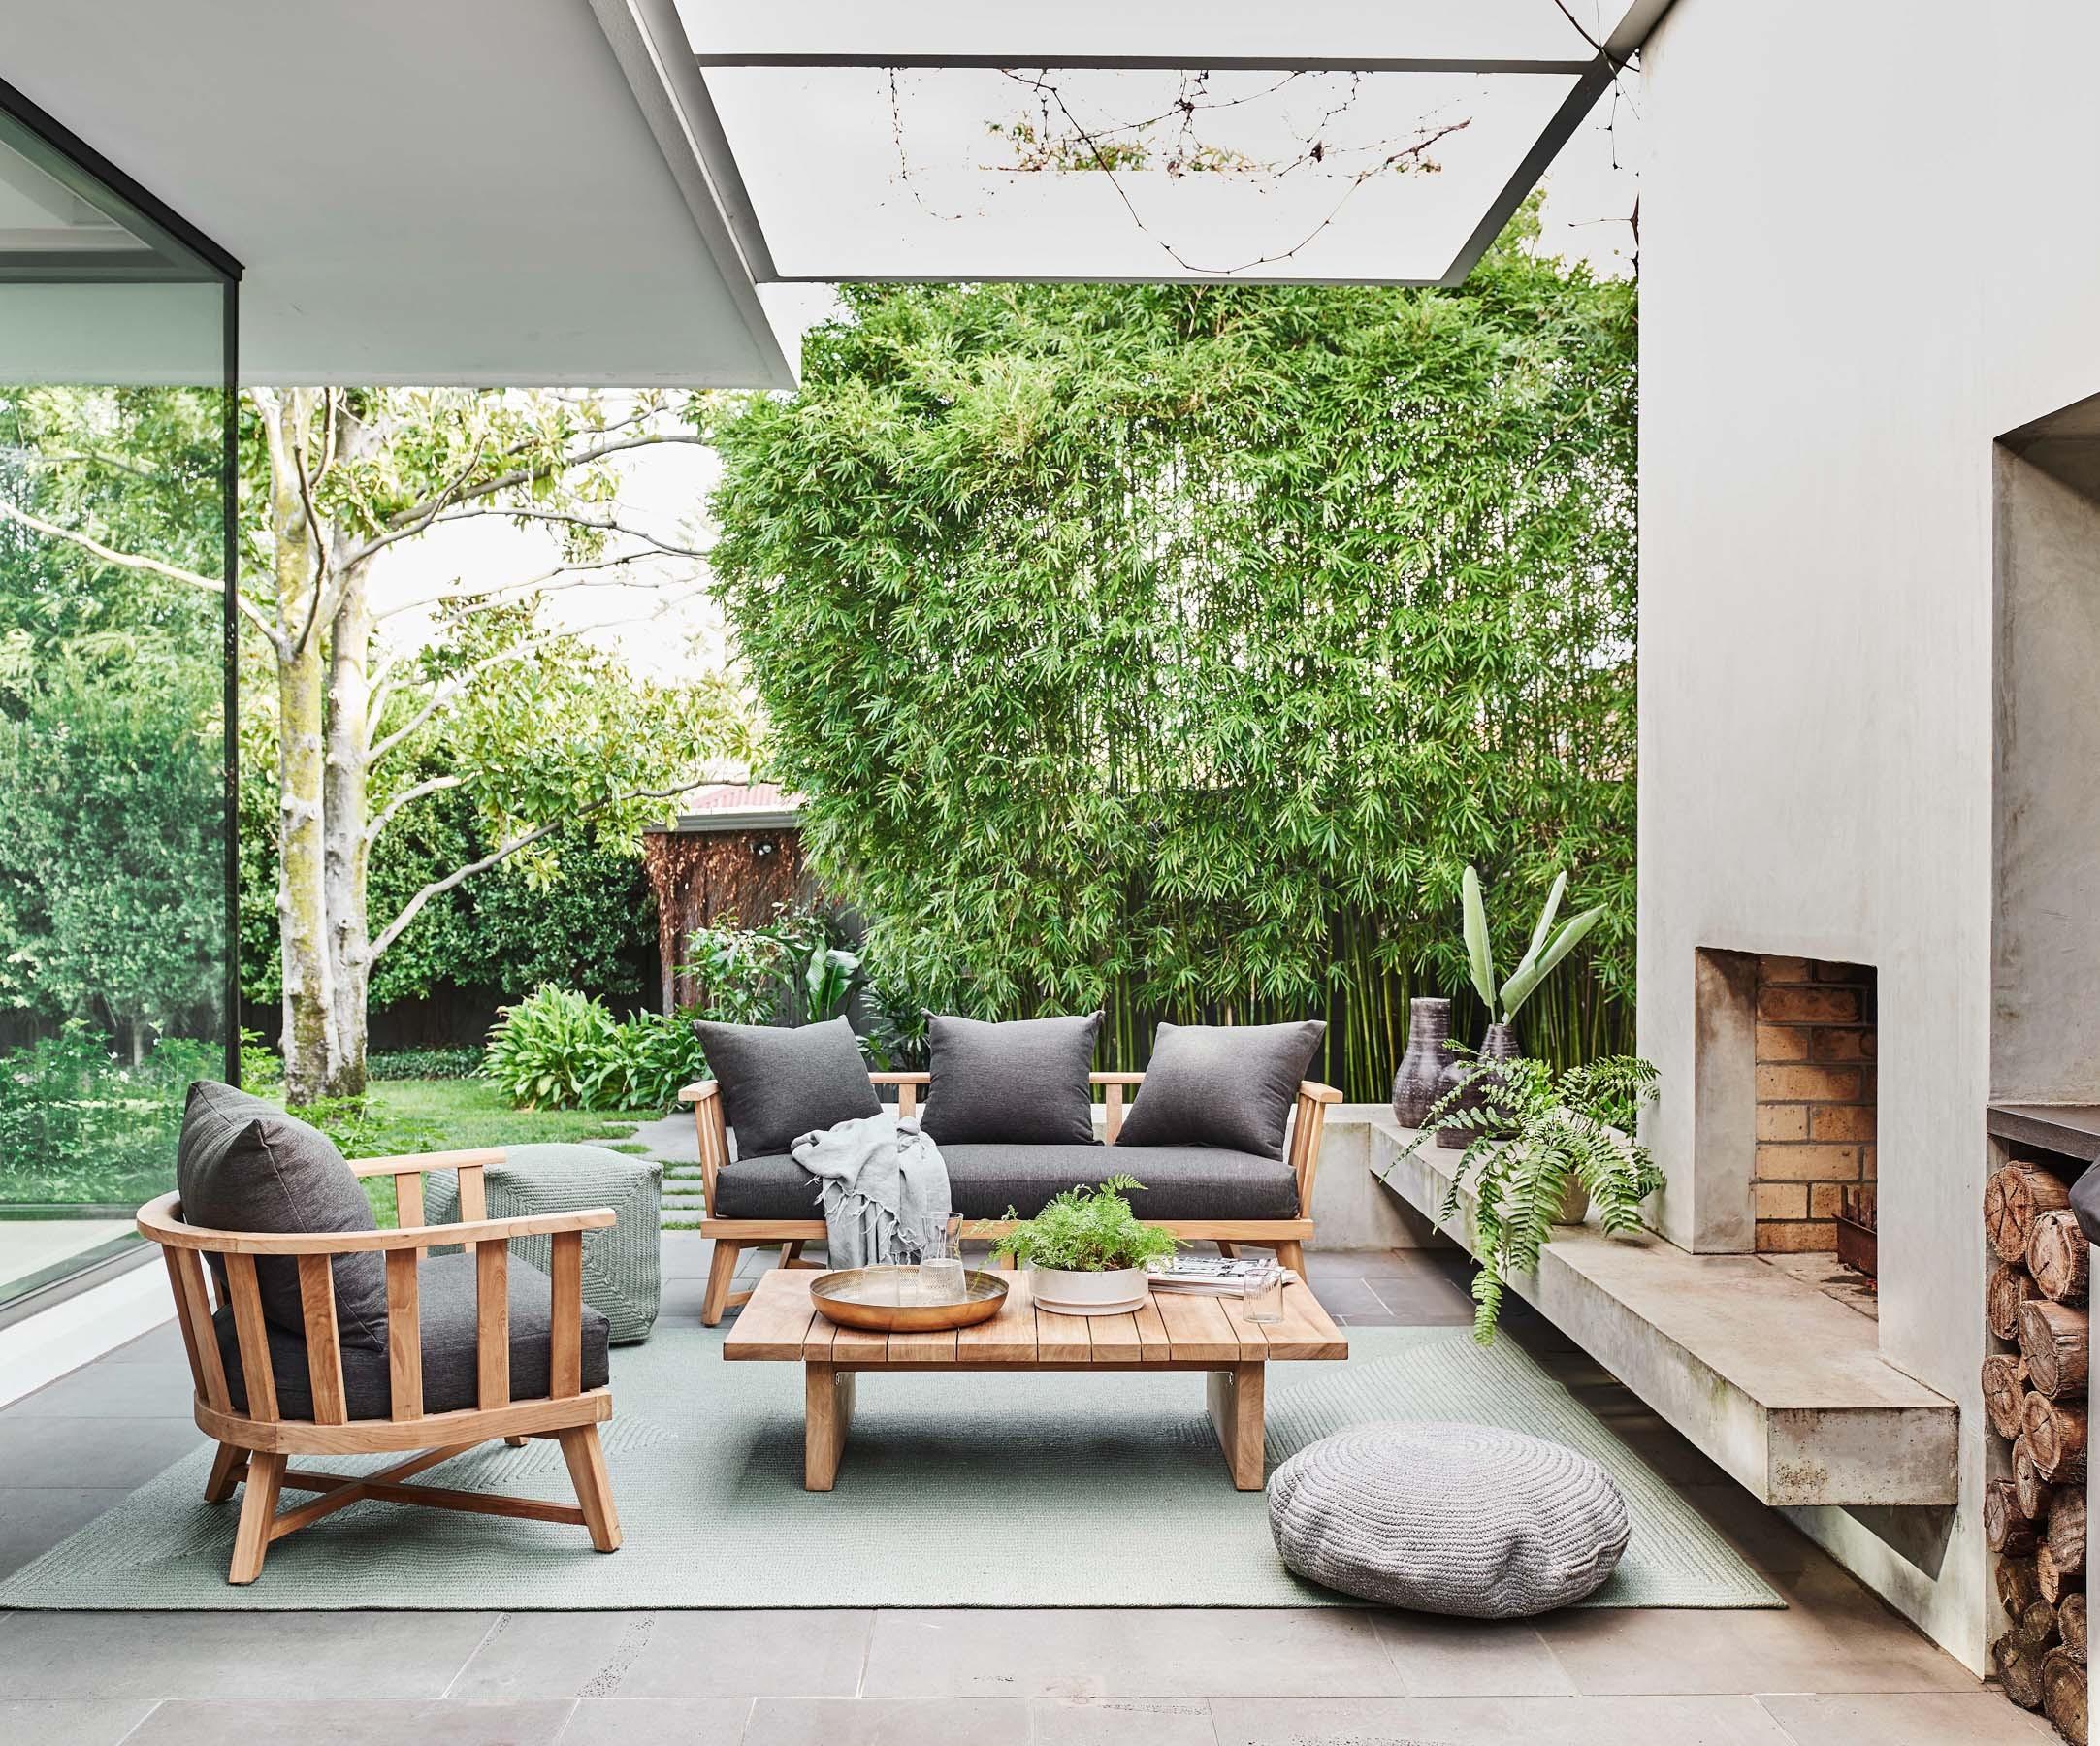 Furniture Gallery Sofas sonoma-slat-three-seater-sofa-03